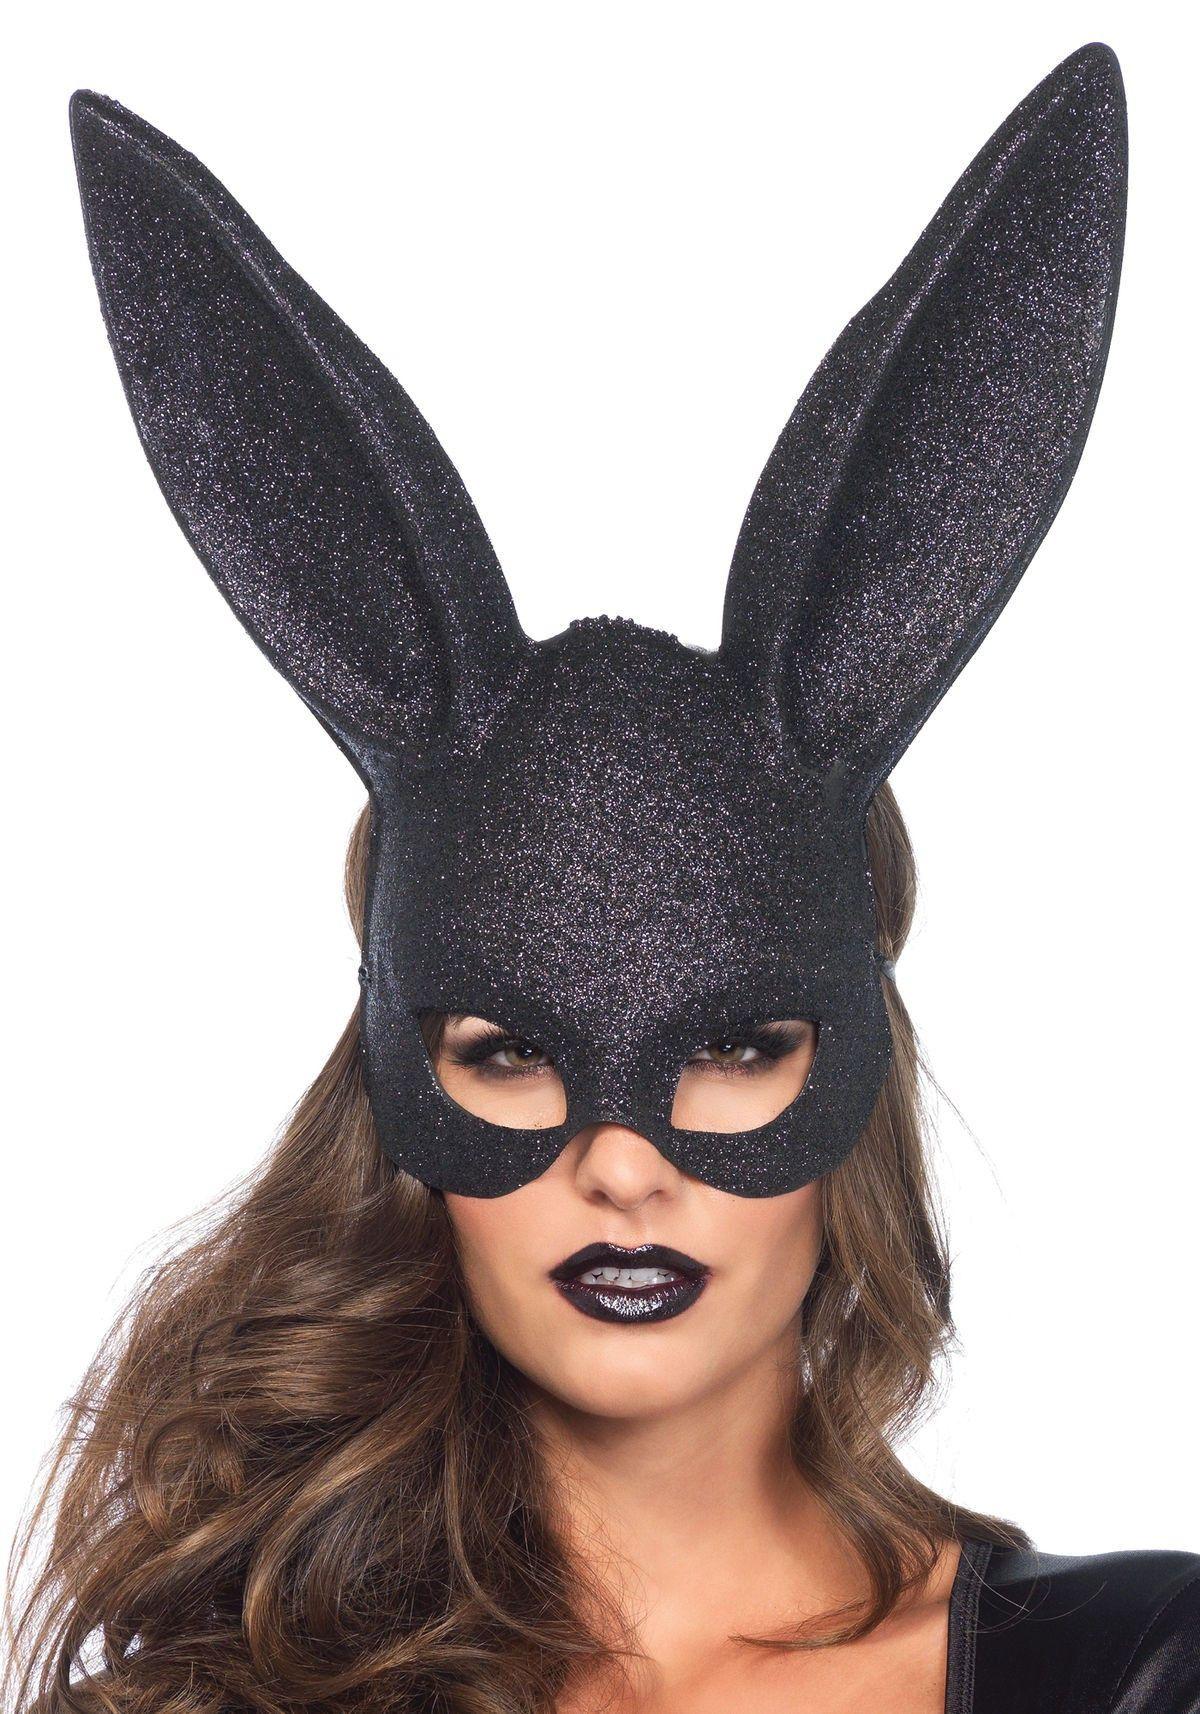 Long Ears Rabbit Bunny Mask Grande Halloween Party Costume Cosplay Masquerade